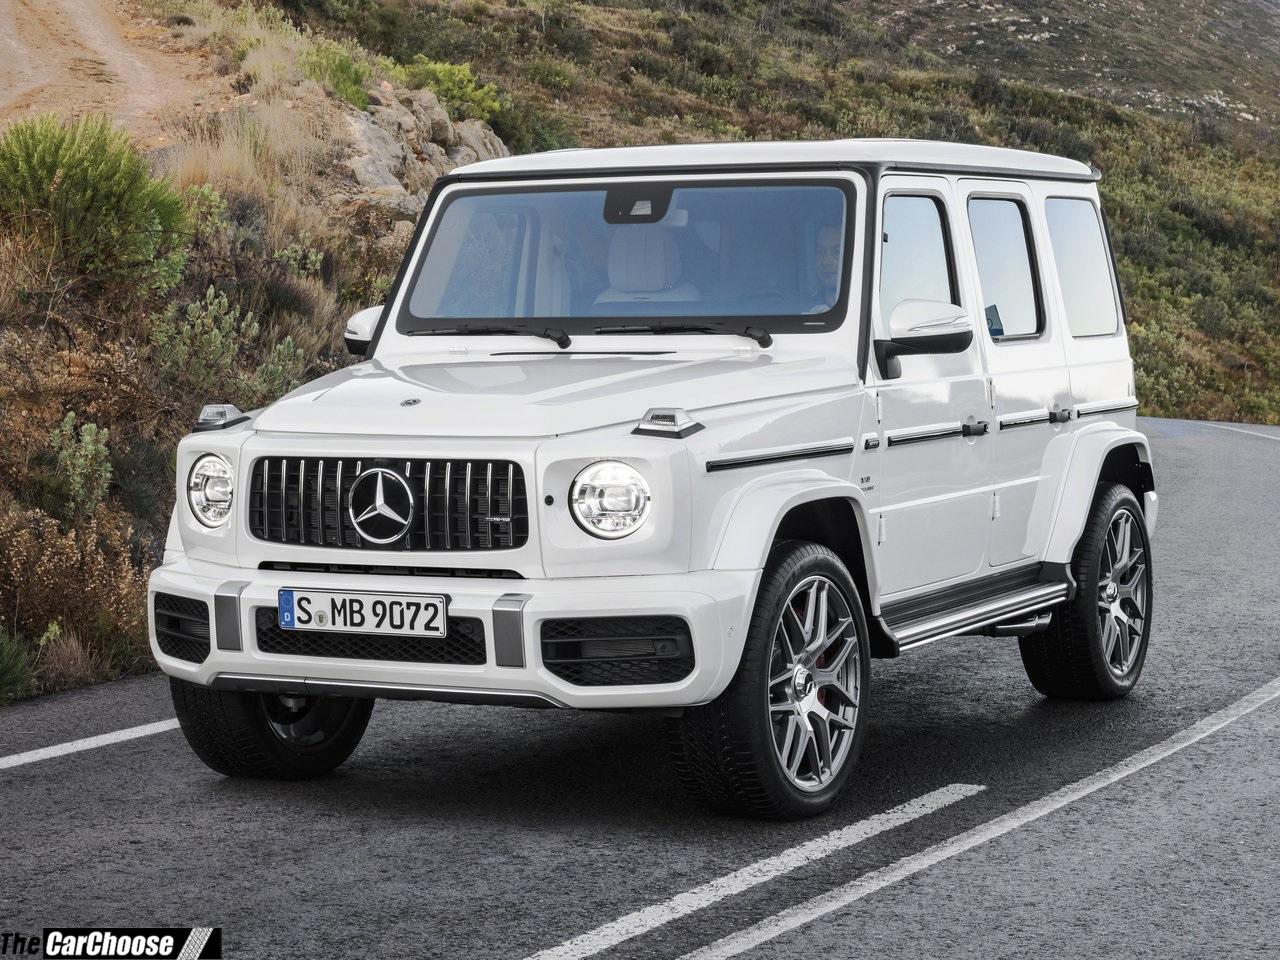 mercedes-benz g63 amg 2019 details